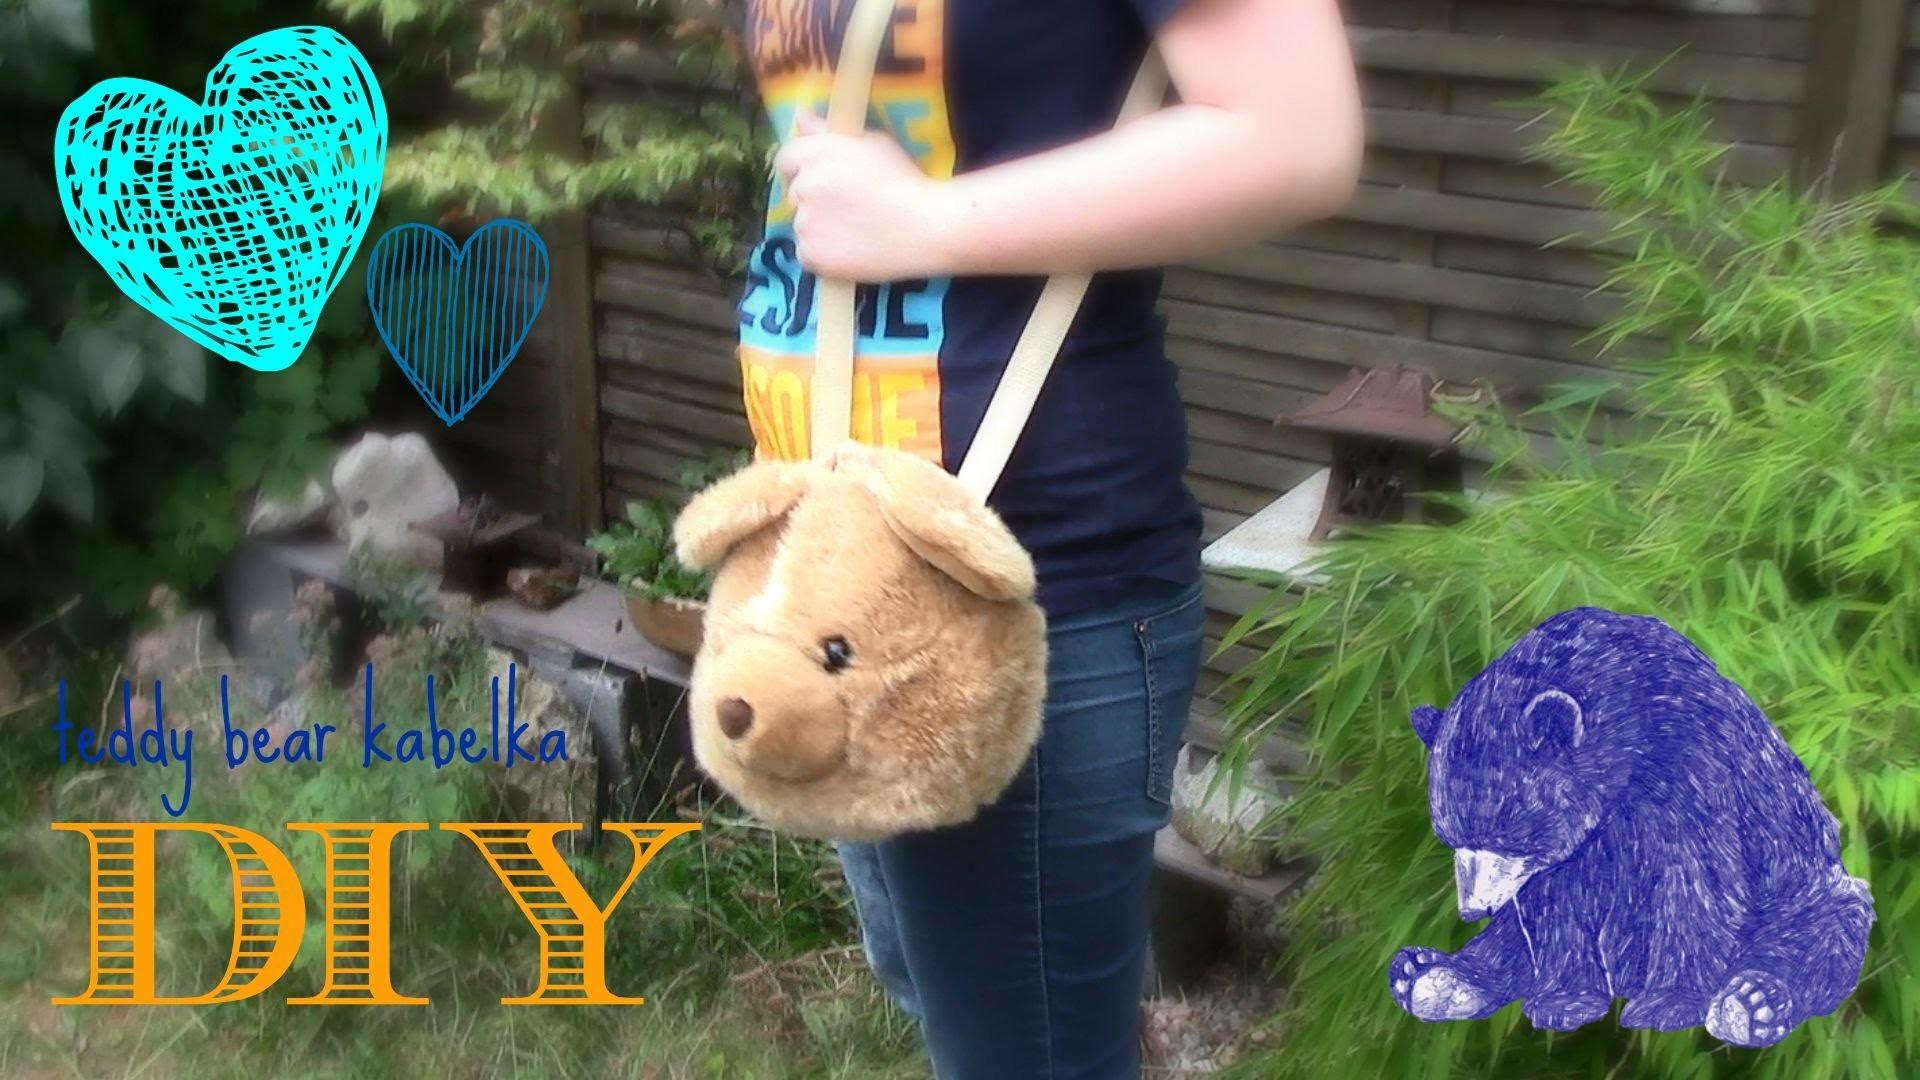 DIY teddy bear kabelka